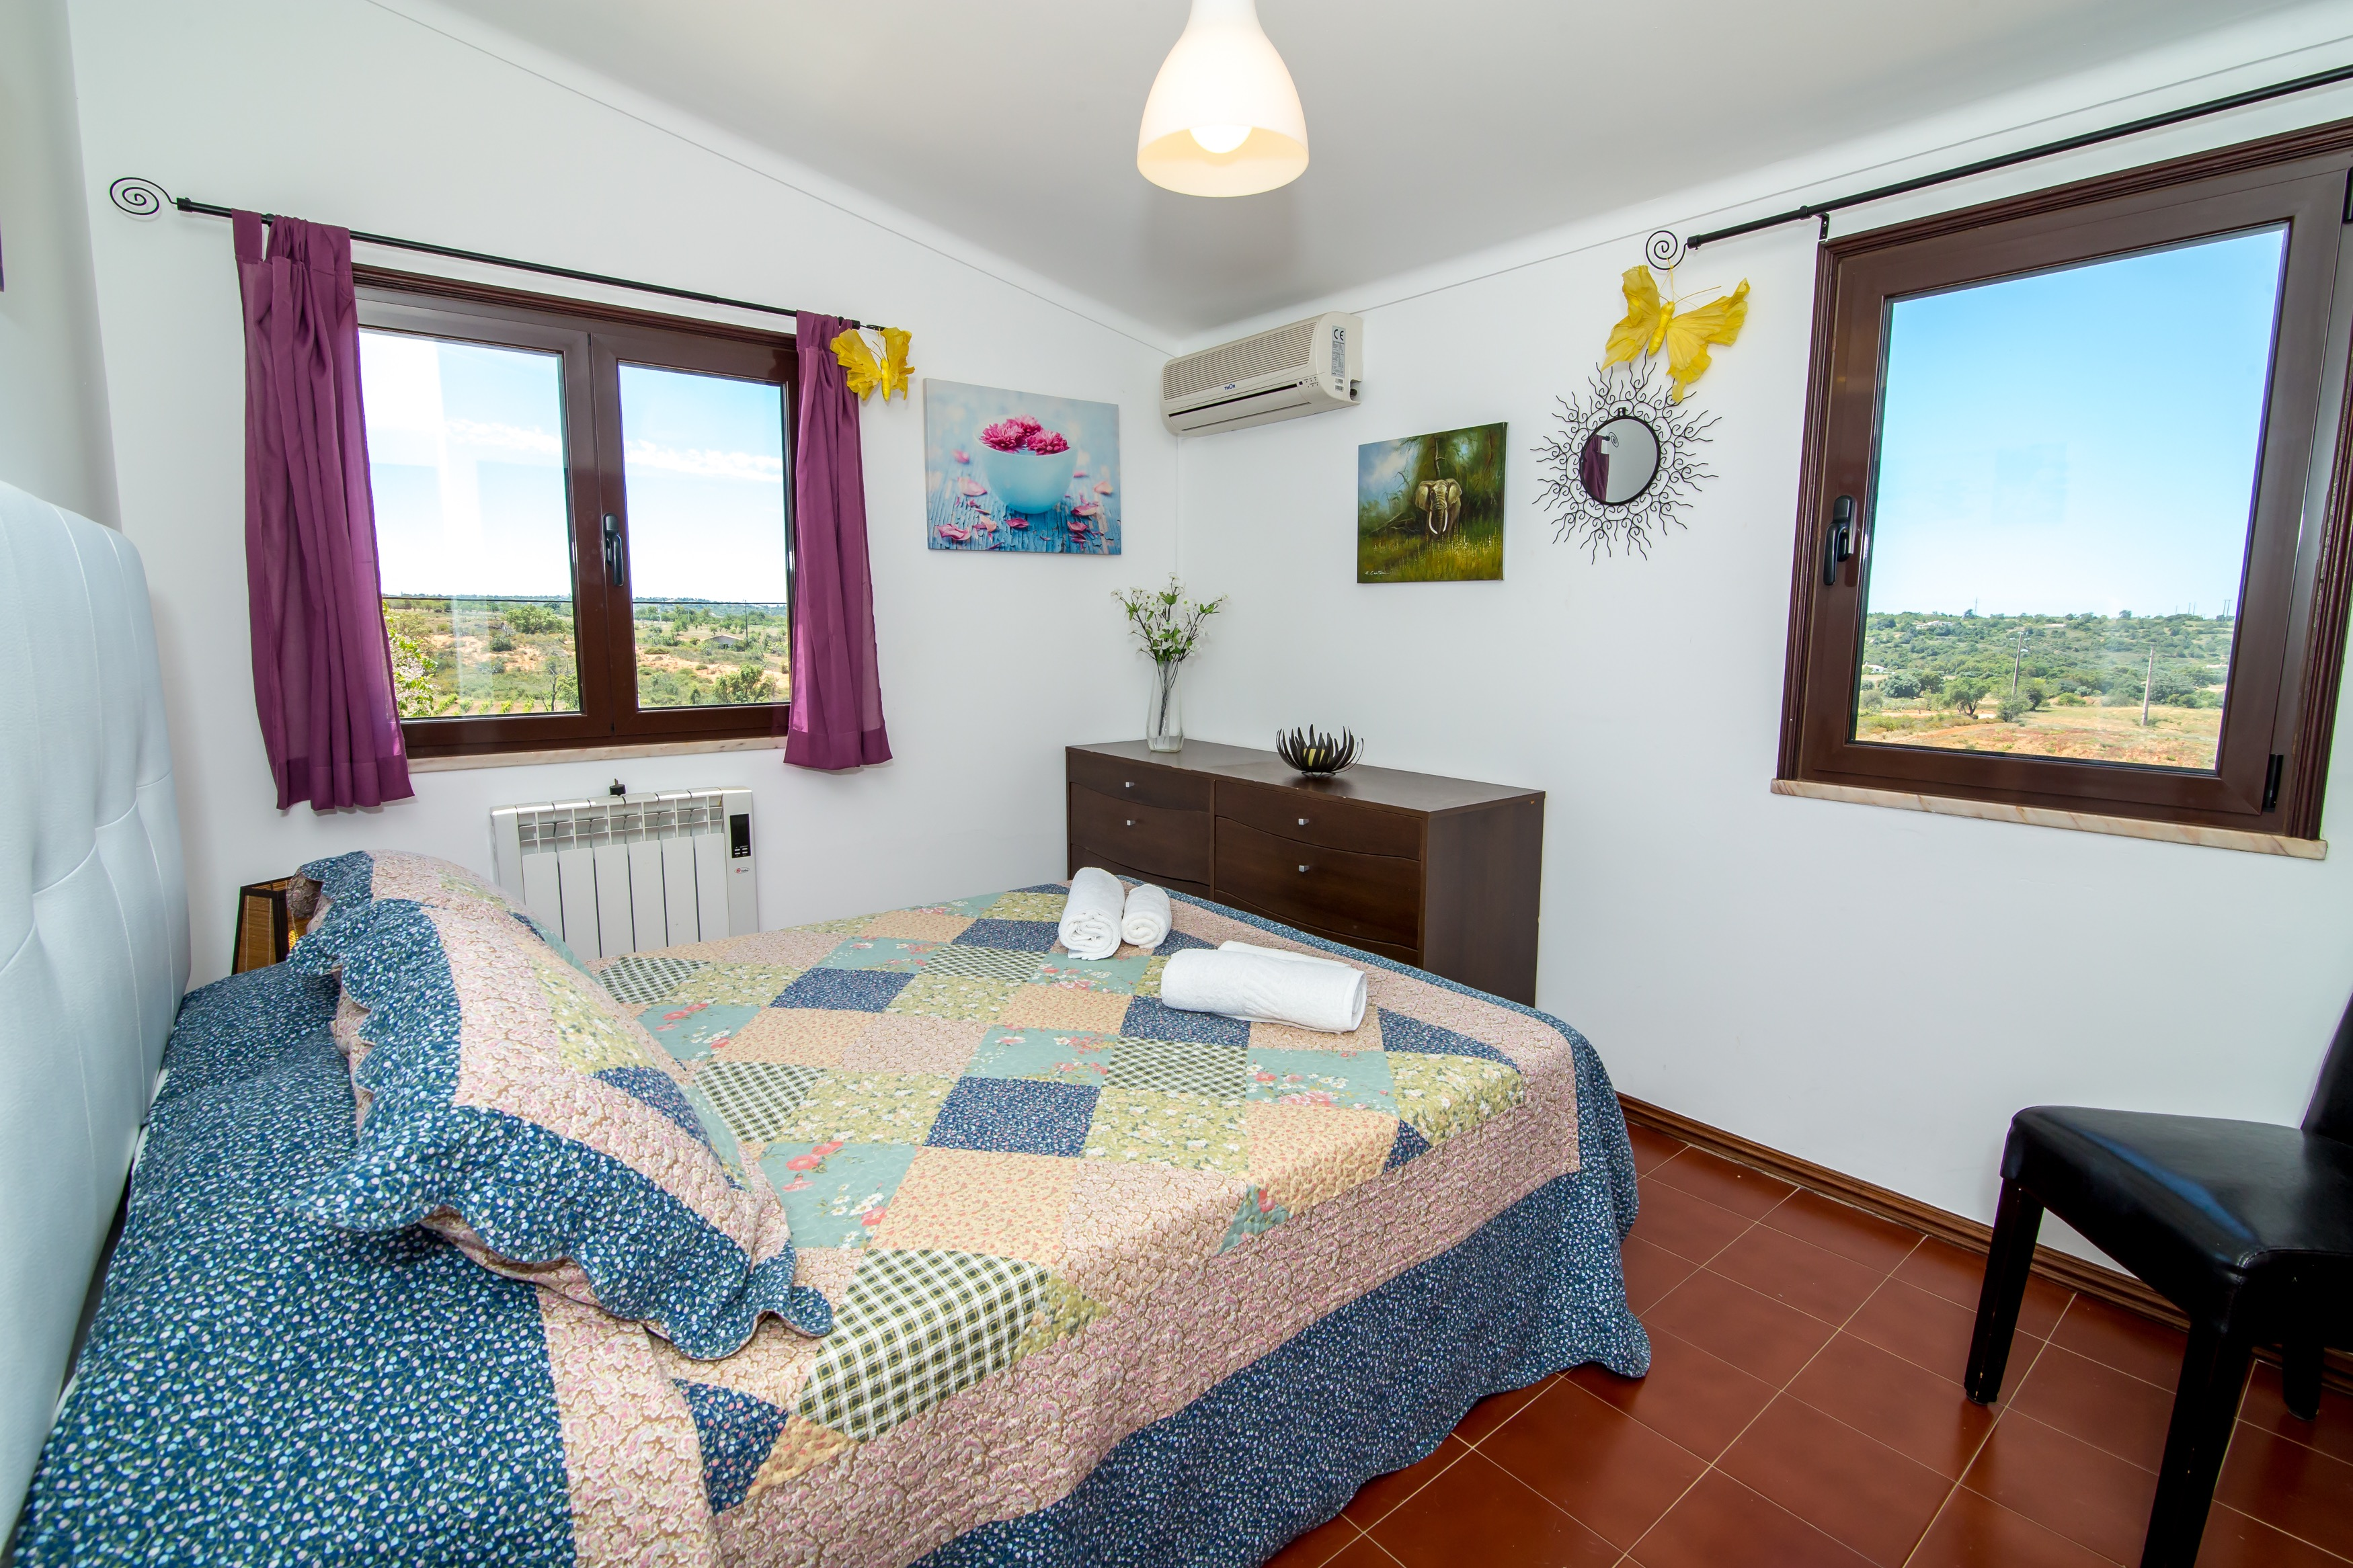 Location appartements et villas de vacance, Villa Barrancos à Guia, Portugal Algarve, REF_IMG_5770_5785